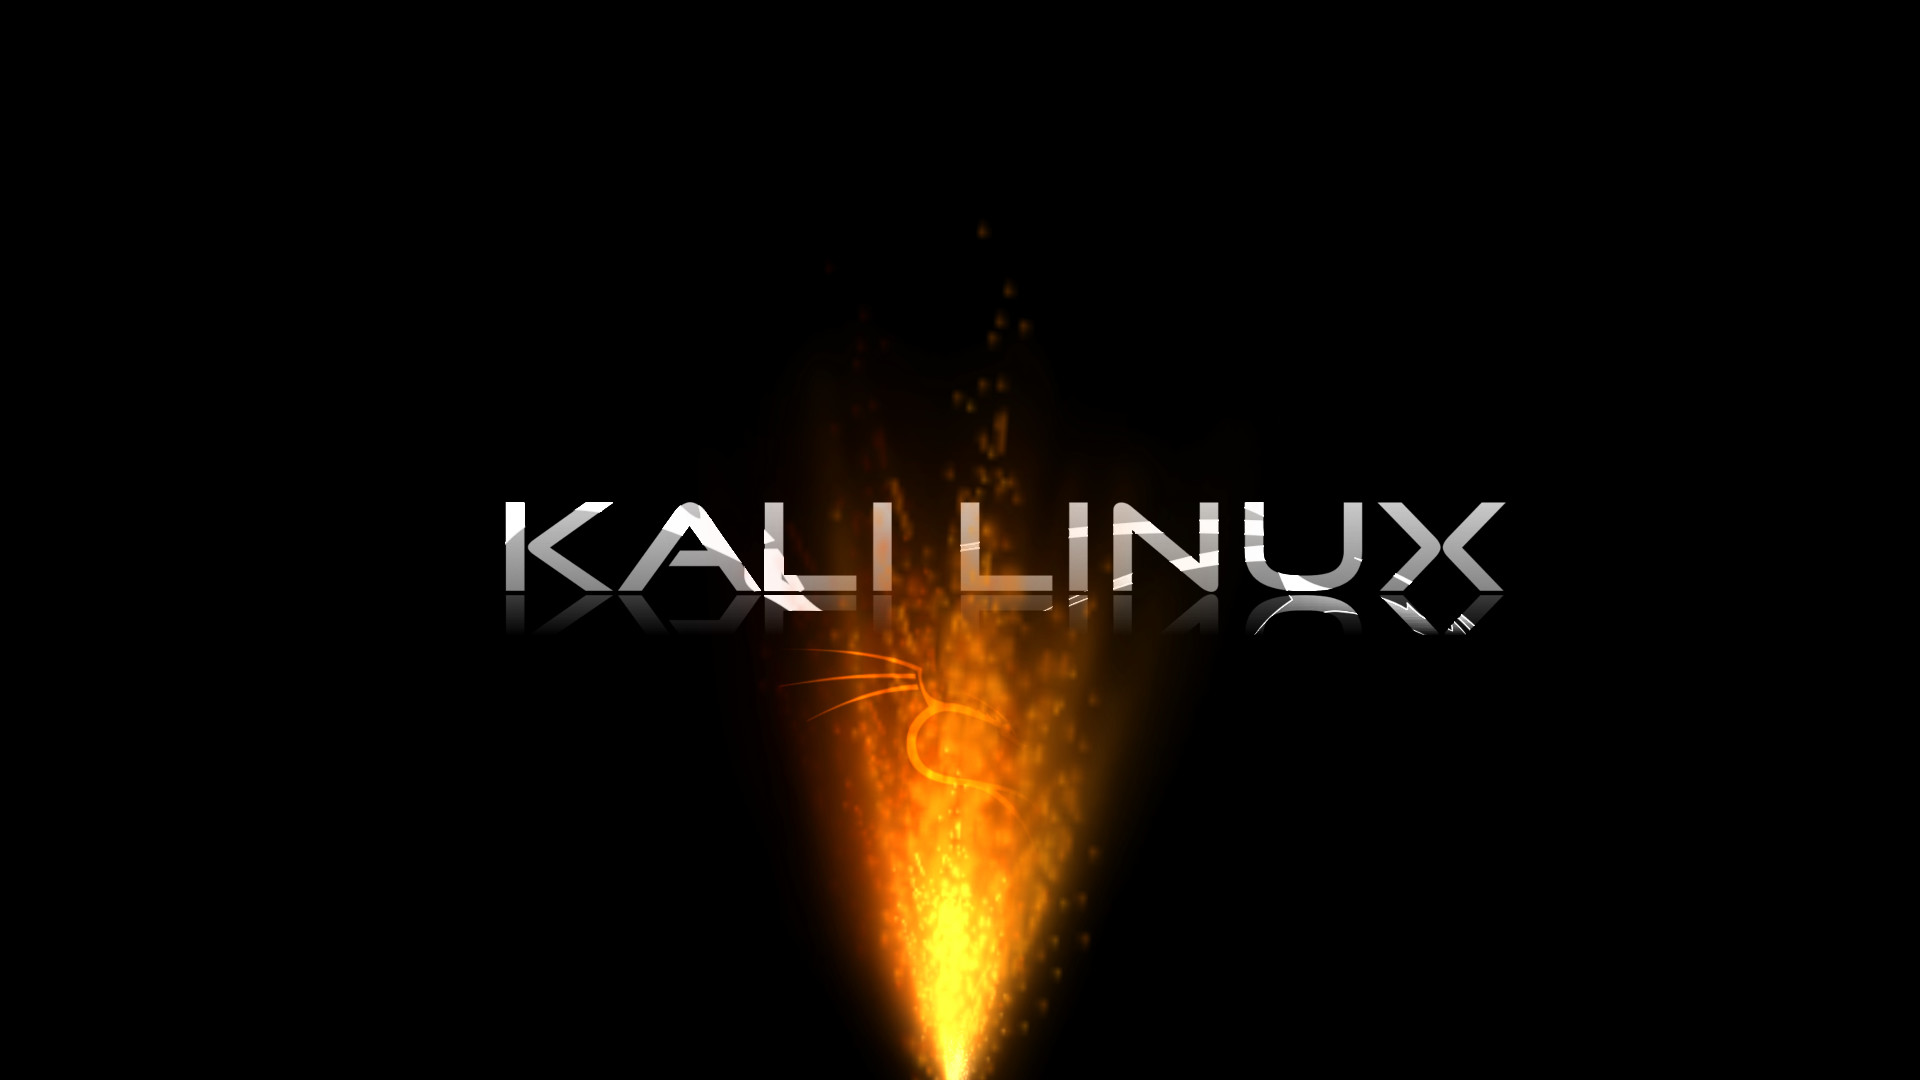 Kali Linux HD Background